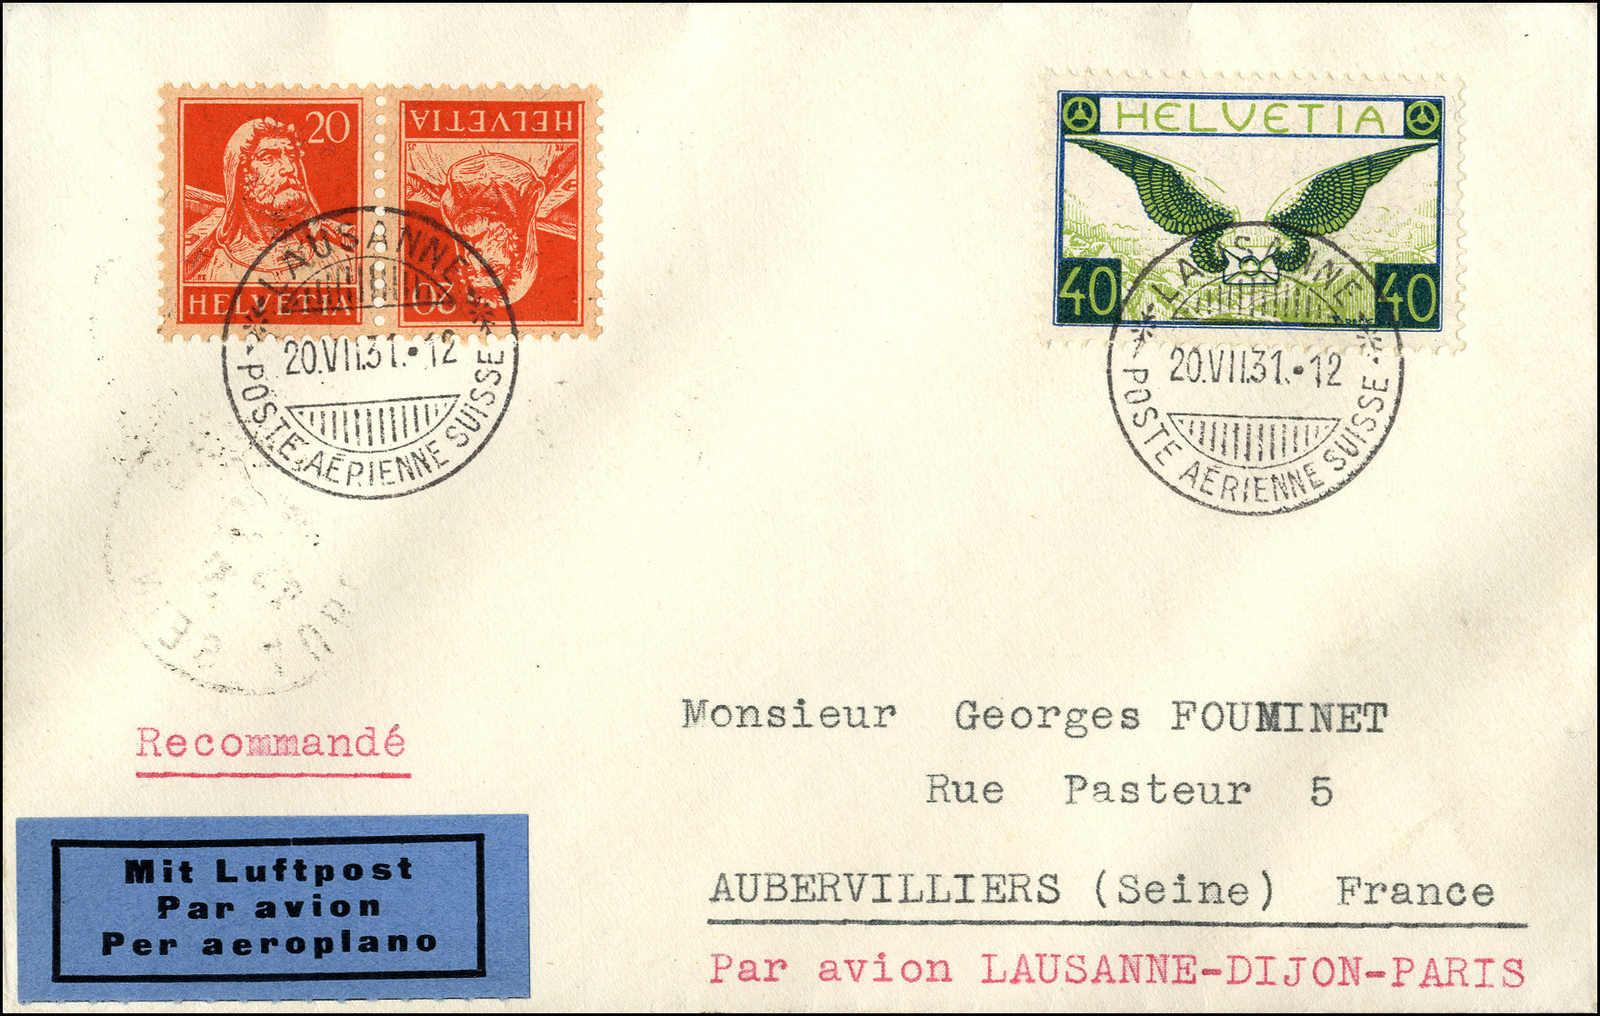 Lot 185 - andere gebiete australien -  Rolli Auctions Auction #68 Day 1